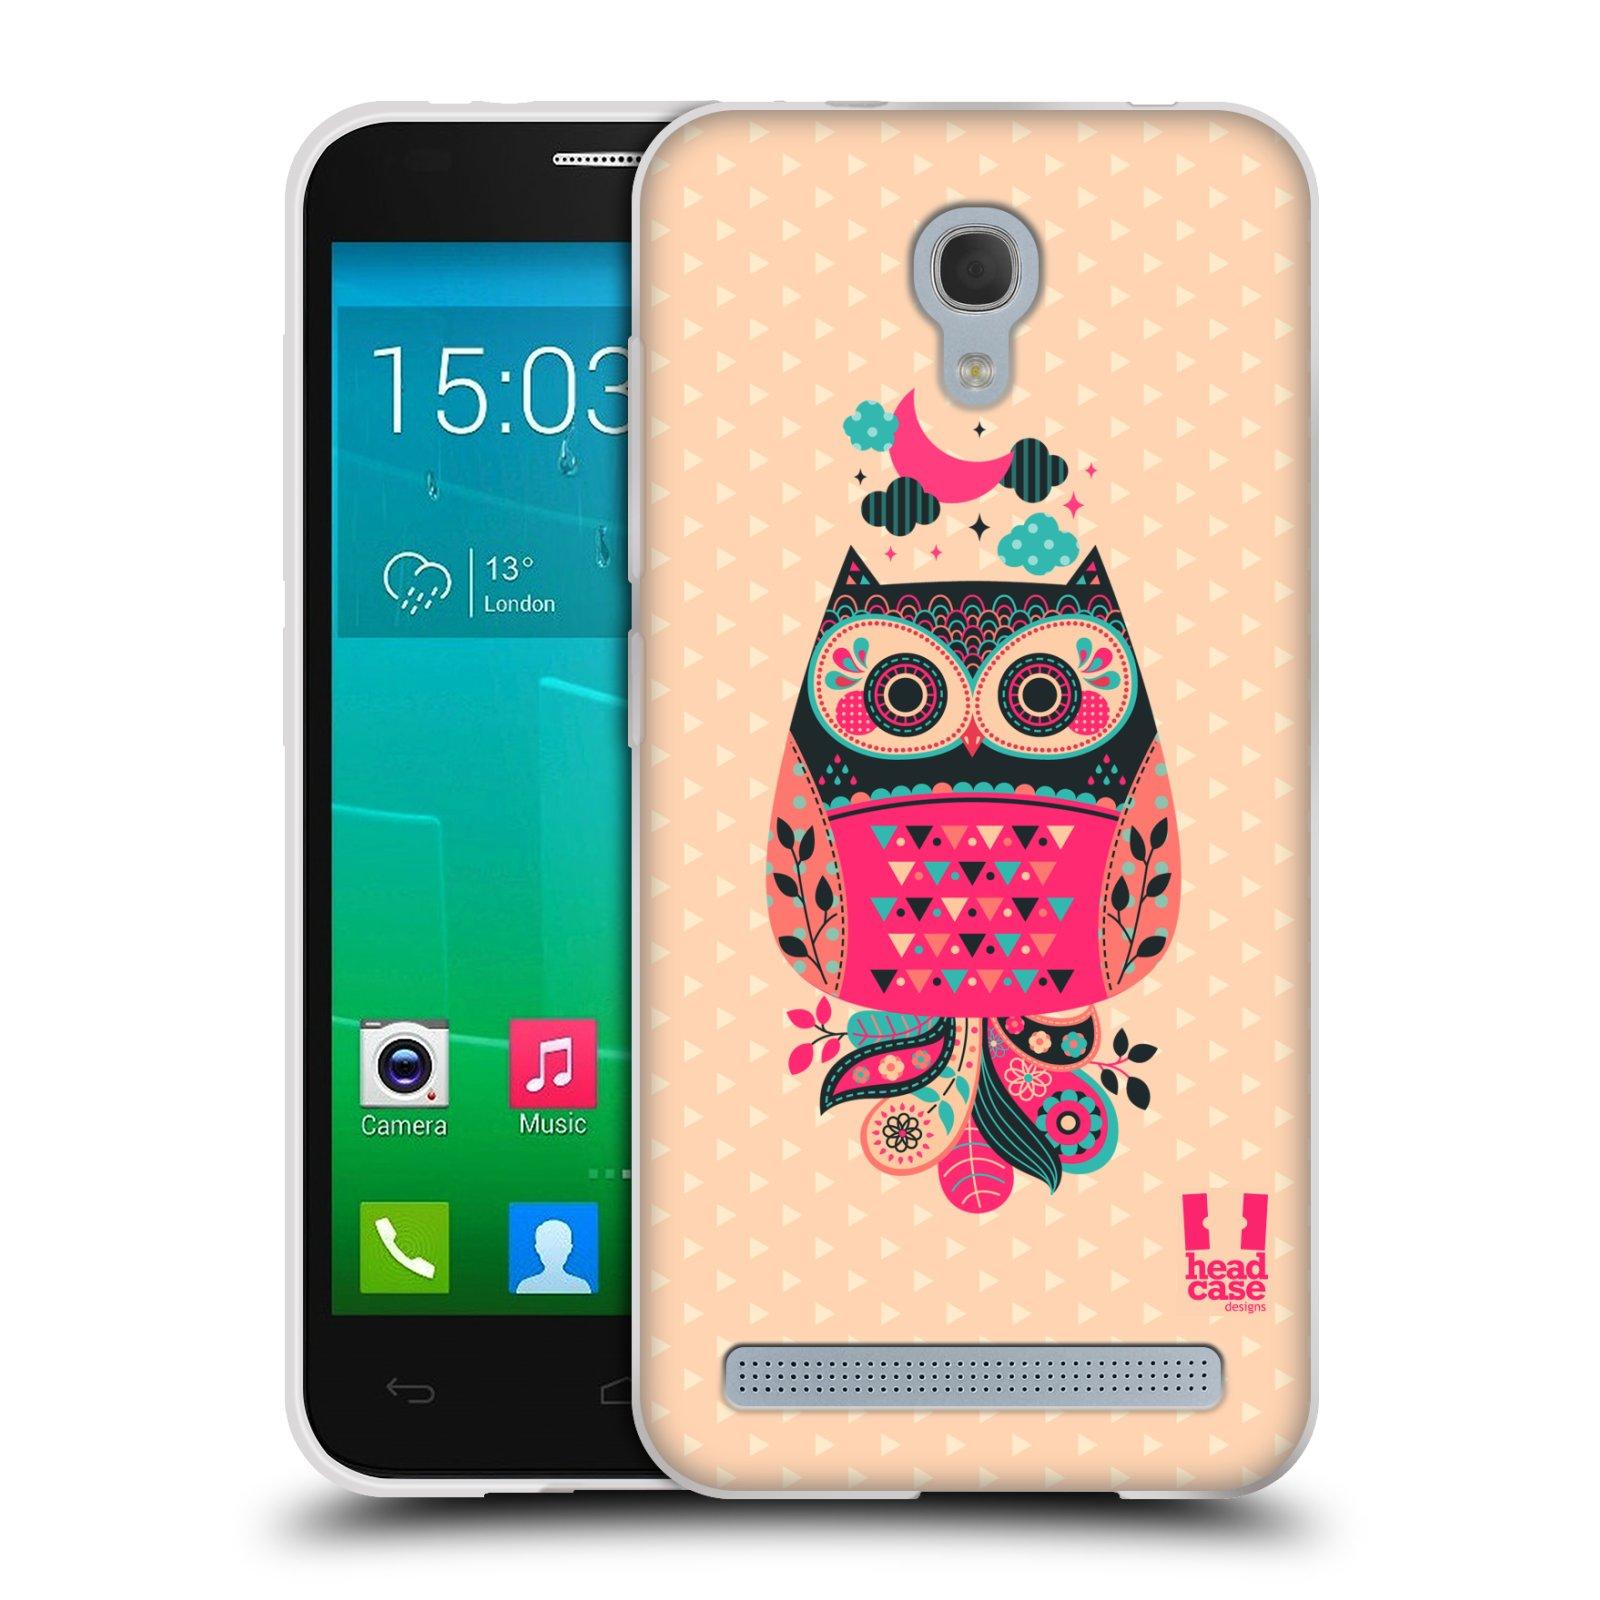 HEAD CASE silikonový obal na mobil Alcatel Idol 2 MINI S 6036Y vzor Stmívání sovička černá a korálová